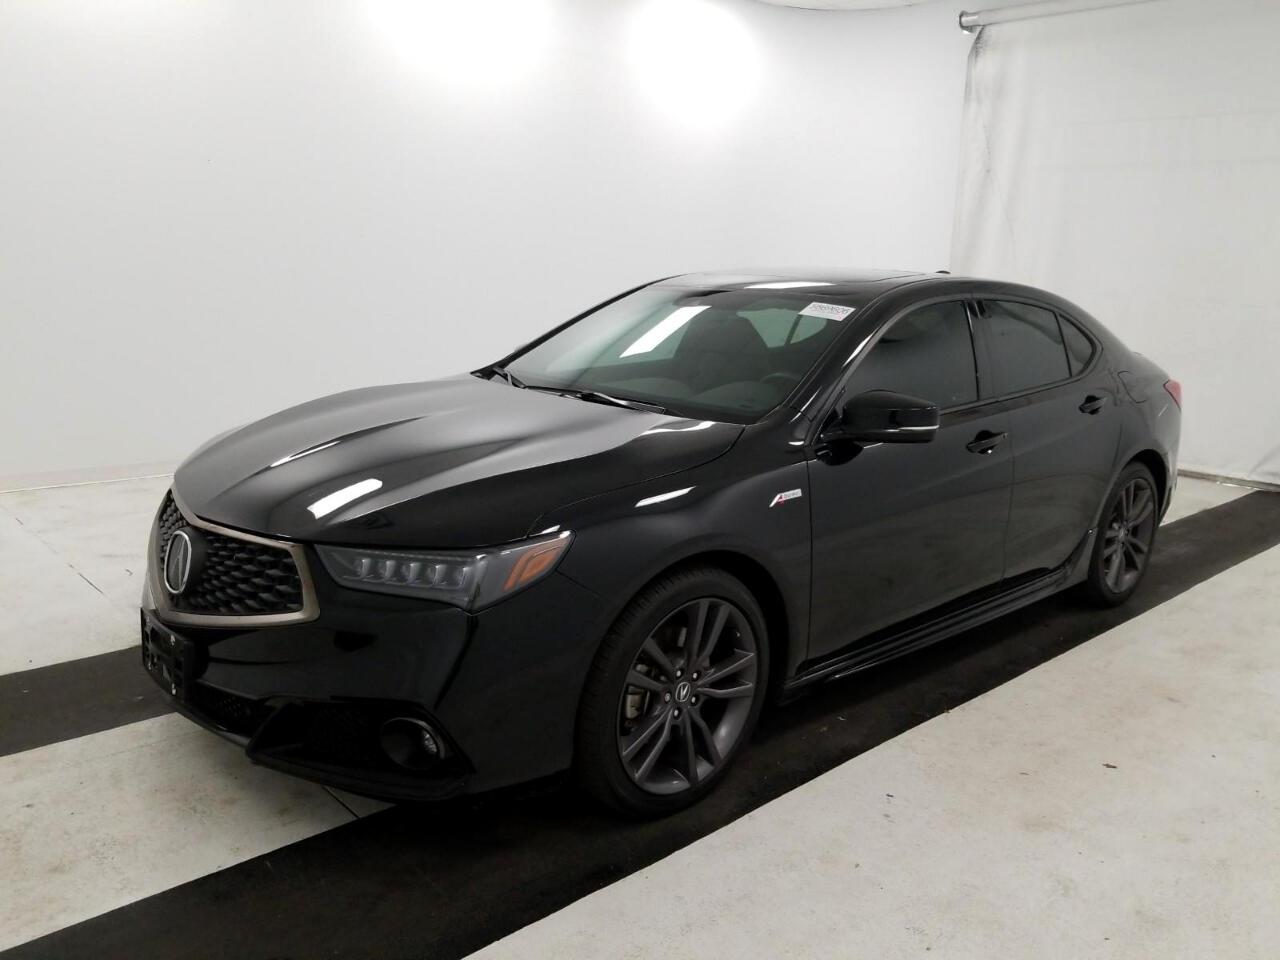 Used 2019 Acura Tlx 3 5l Fwd W A Spec Pkg For Sale In Miami Gardens Fl 33023 Car Club Usa